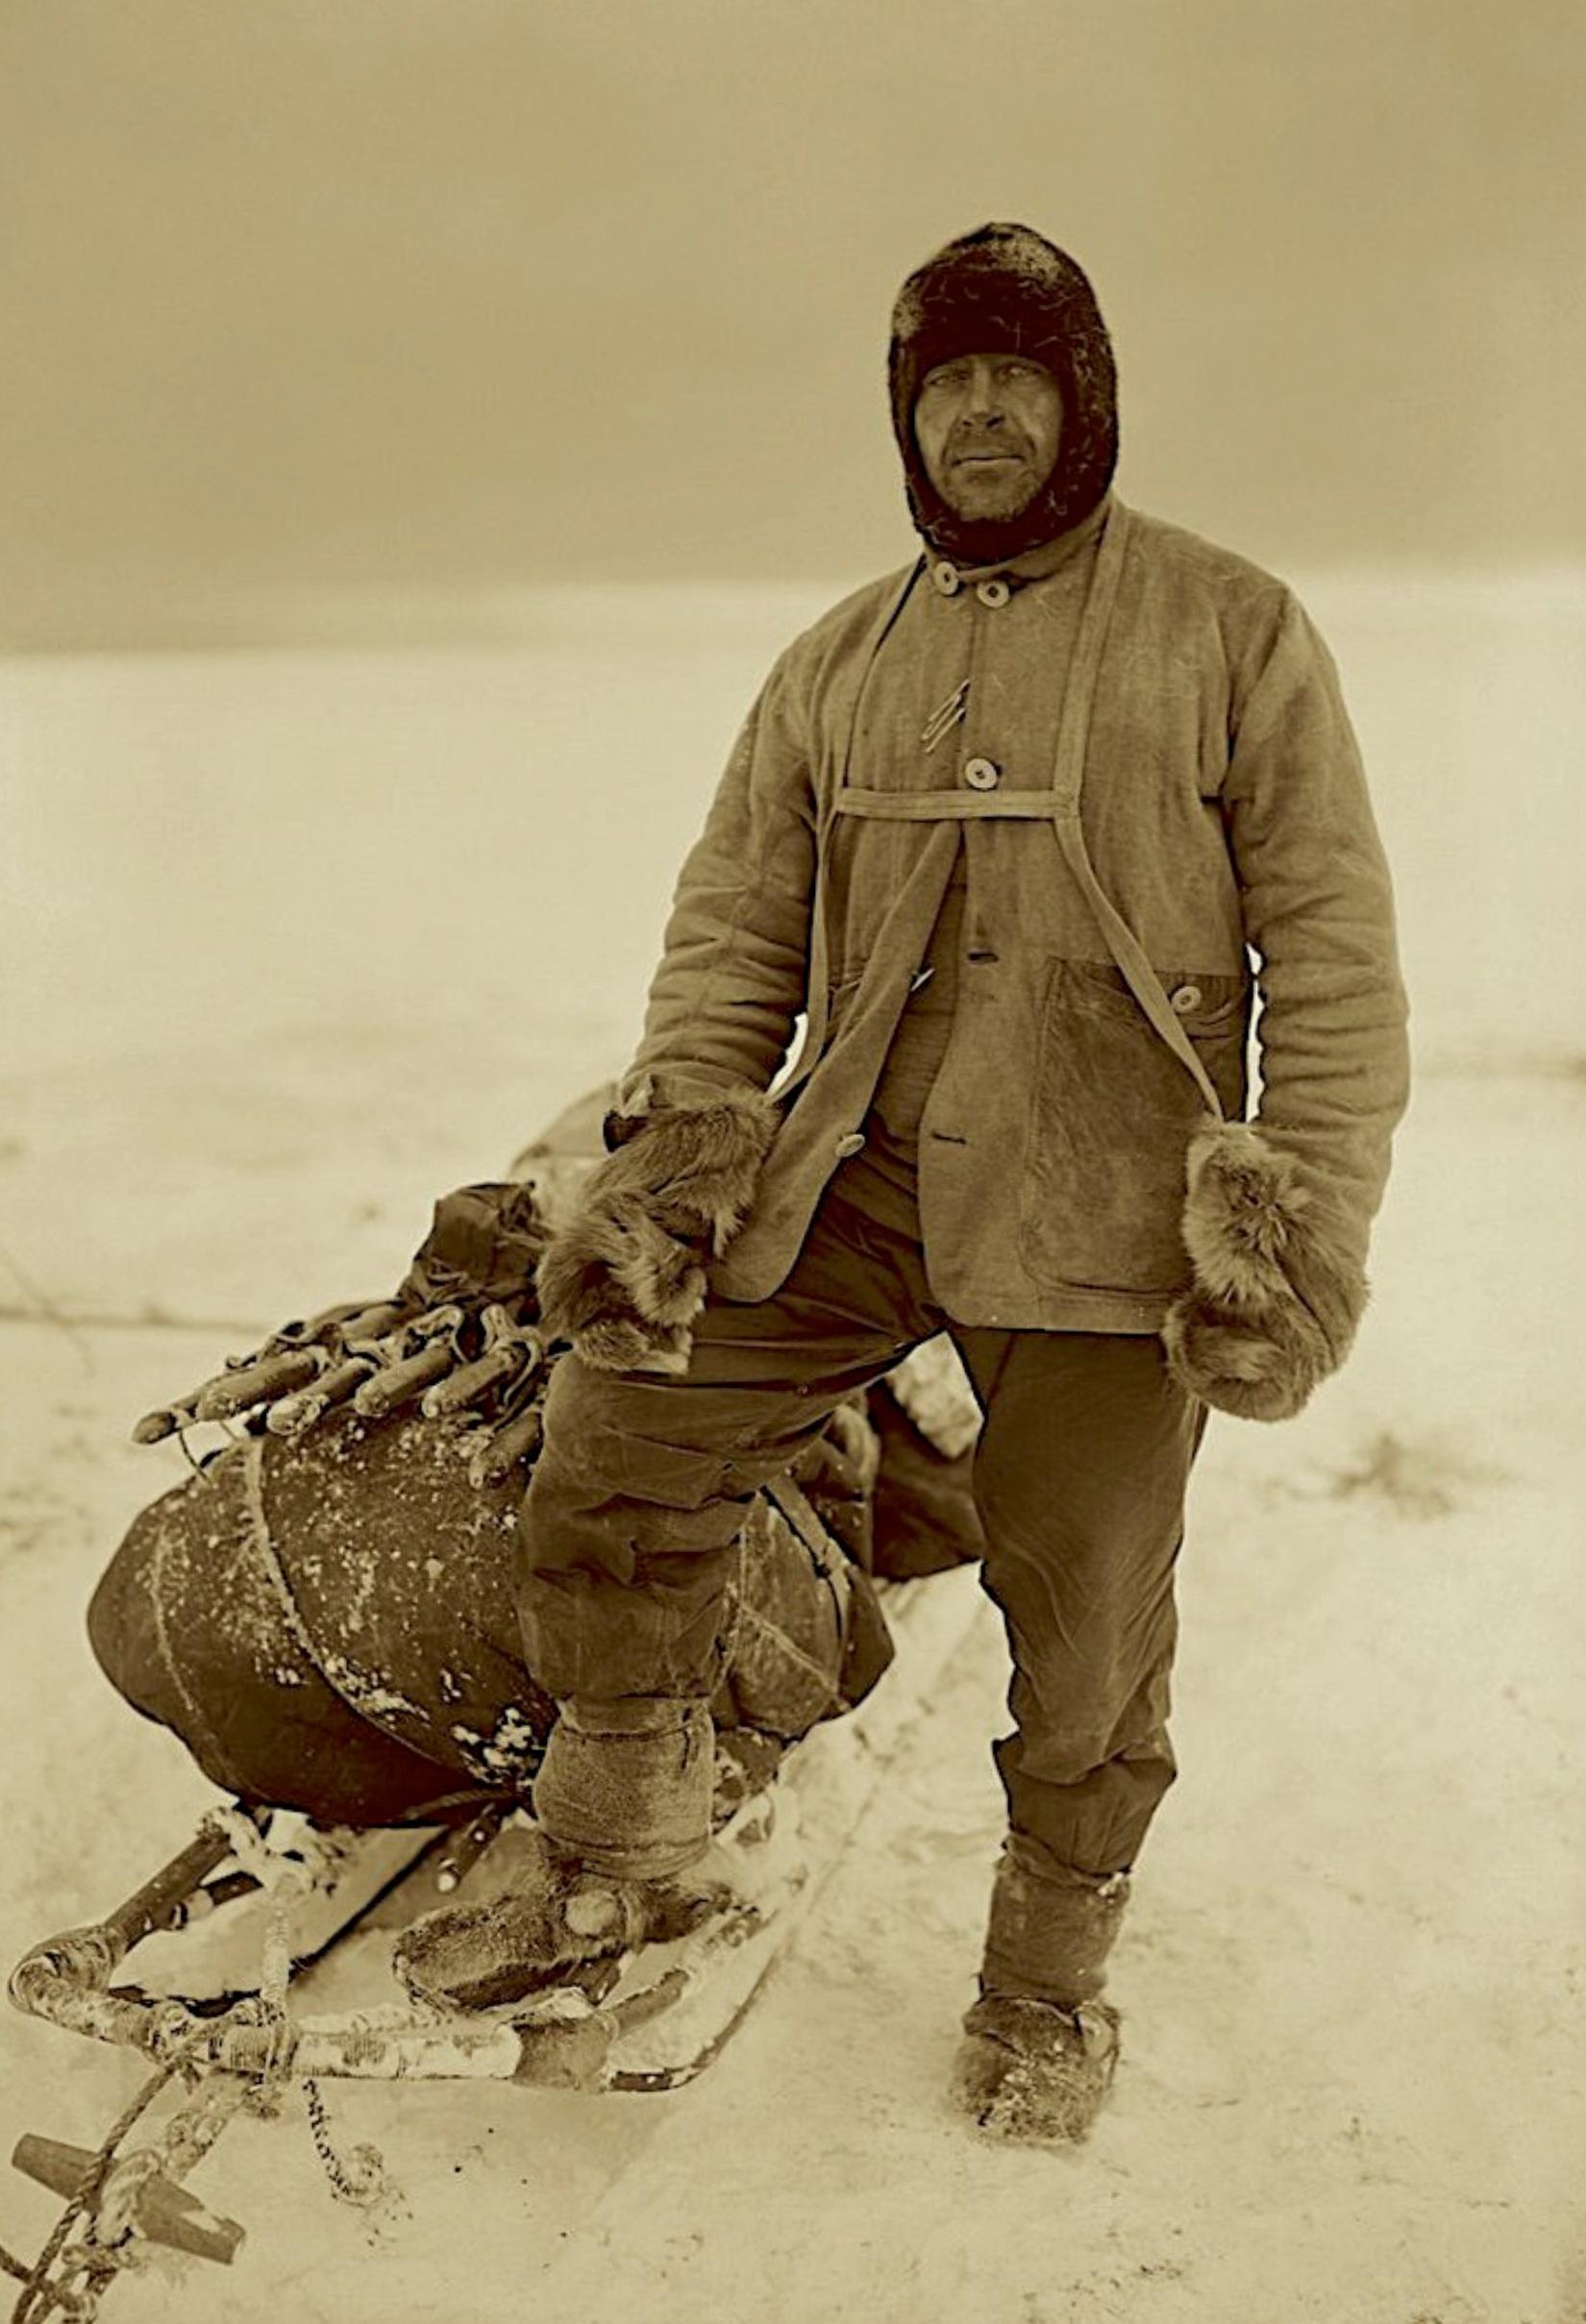 Captain Robert Falcon Scott. 1910-1913.